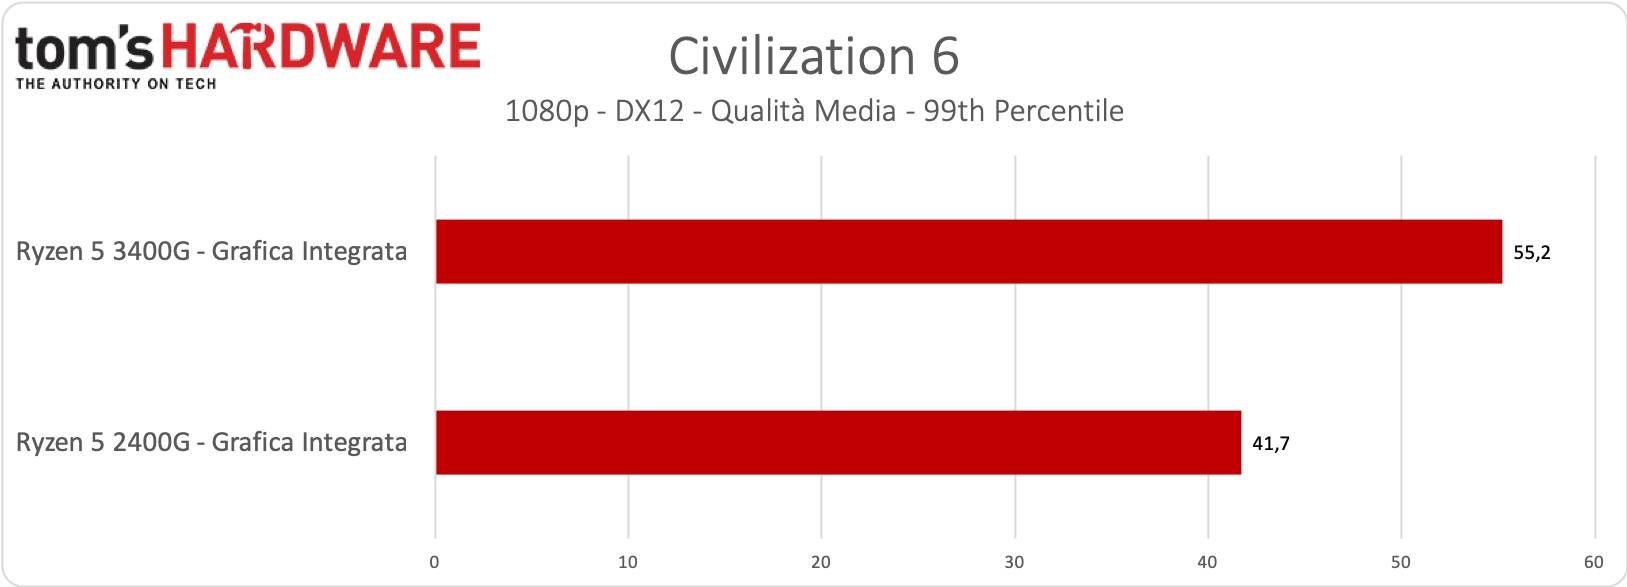 Ryzen 5 3400 - Grafica Integrata - Civilization 6